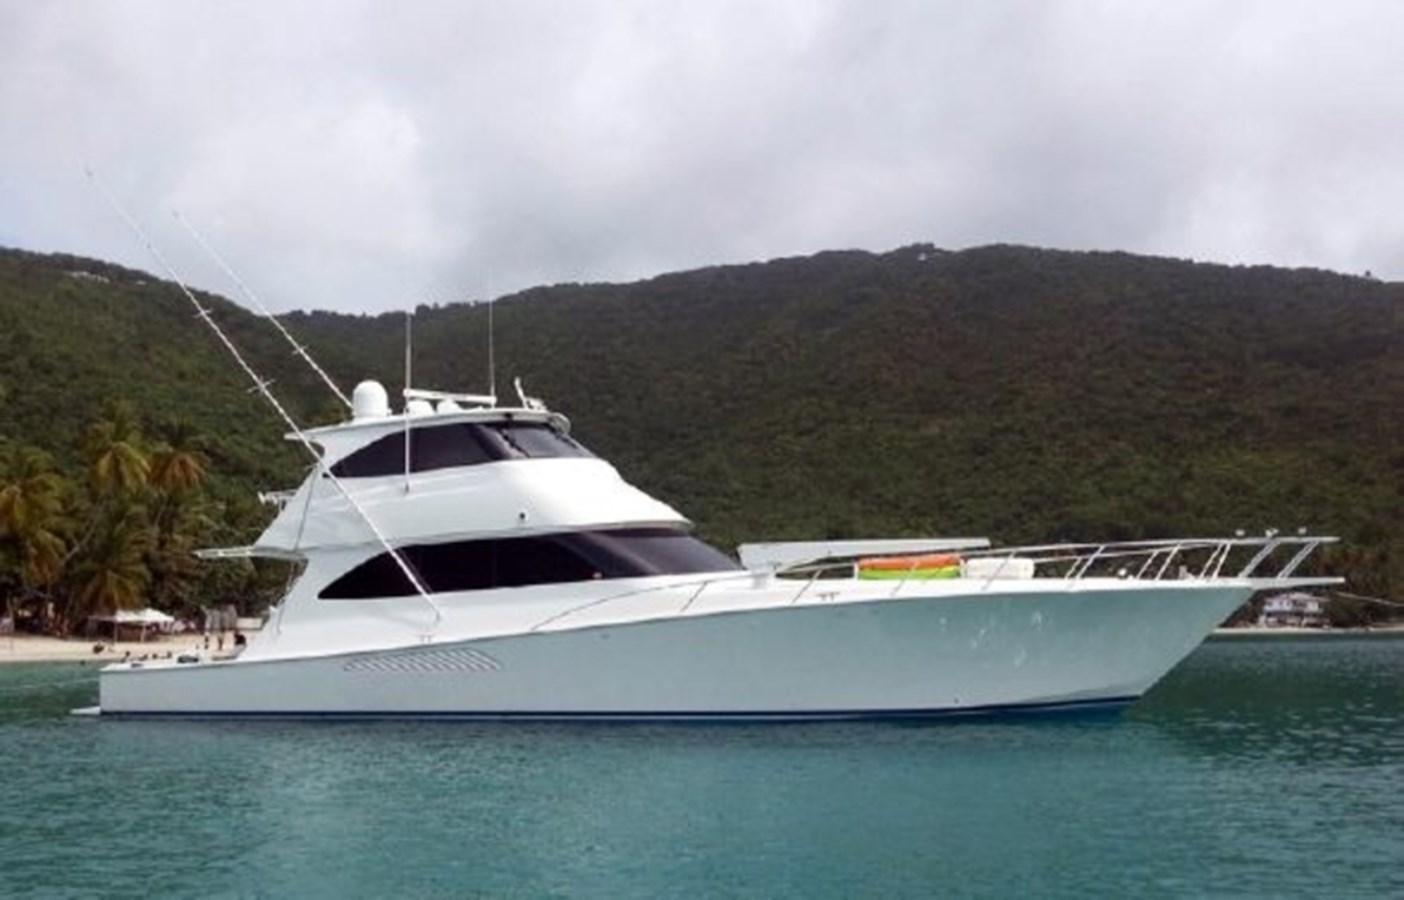 Webp.net-resizeimage 2010 VIKING  Motor Yacht 2897414